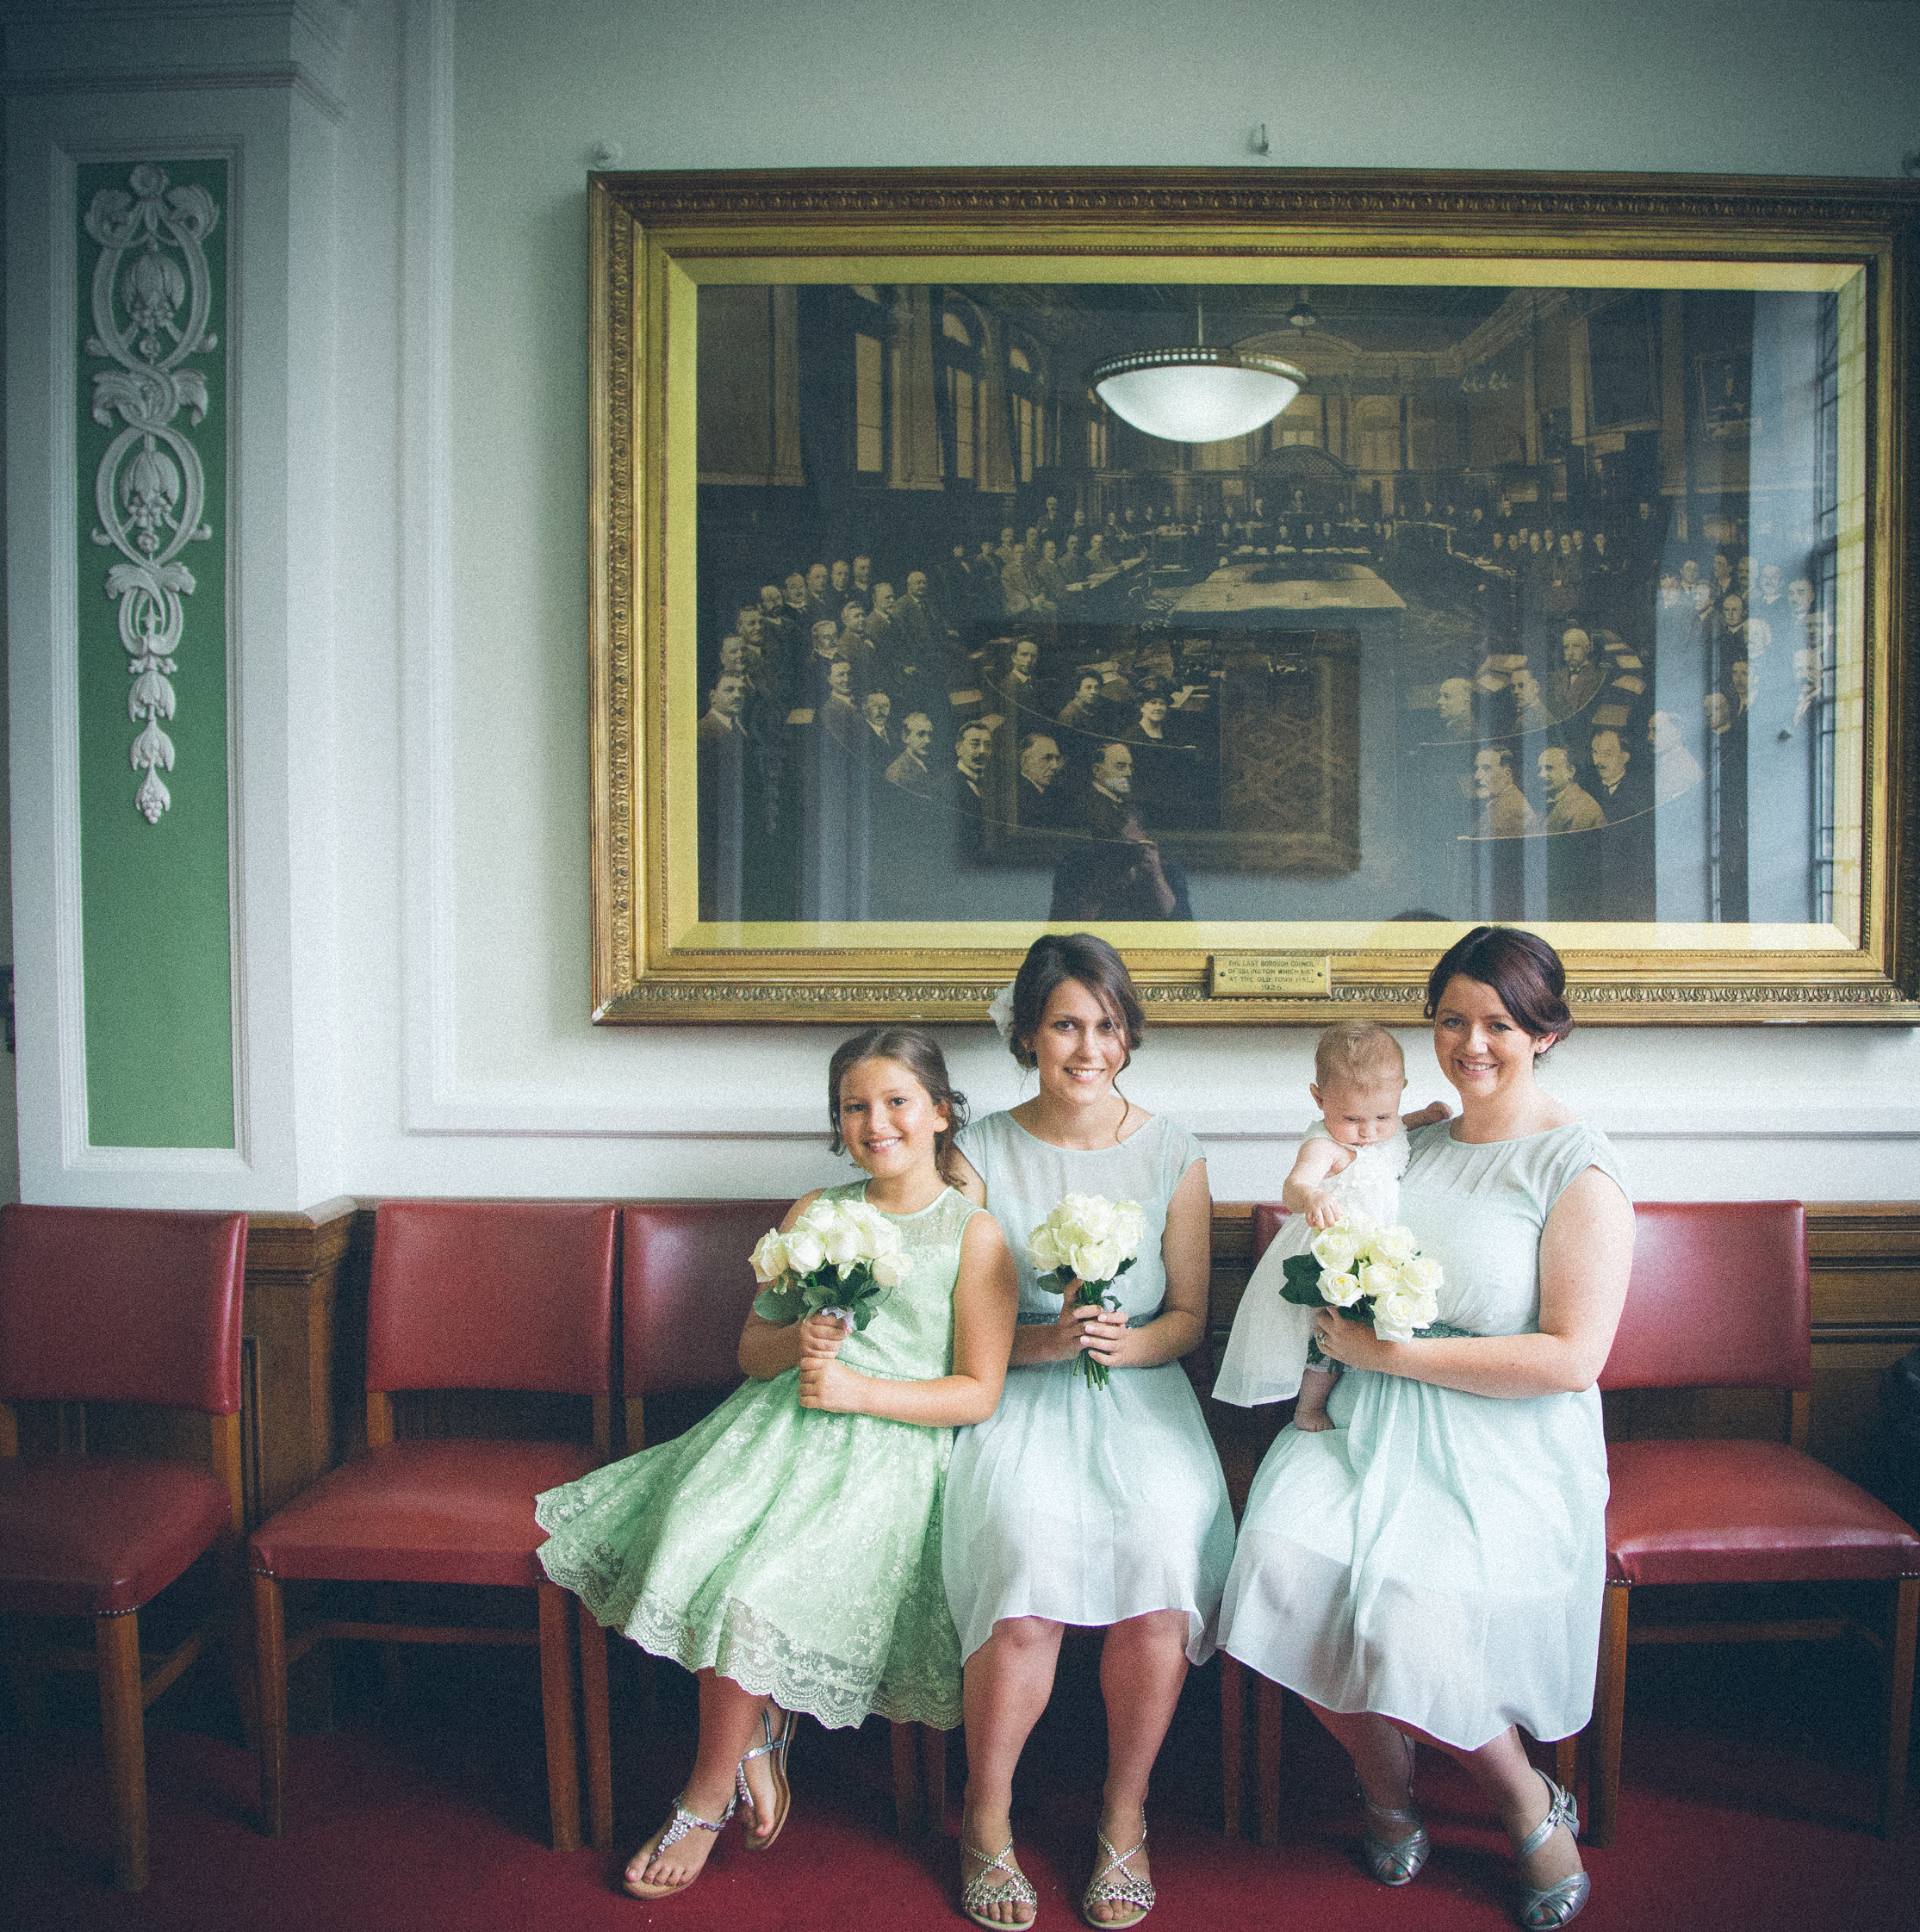 islington-town-hall-bridesmaids-1